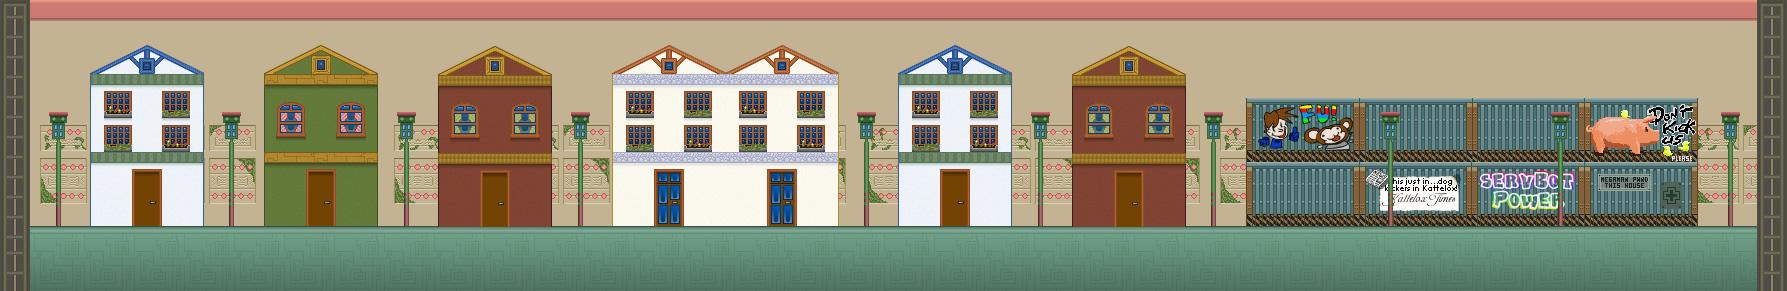 KP - Kattelox Town Mockup